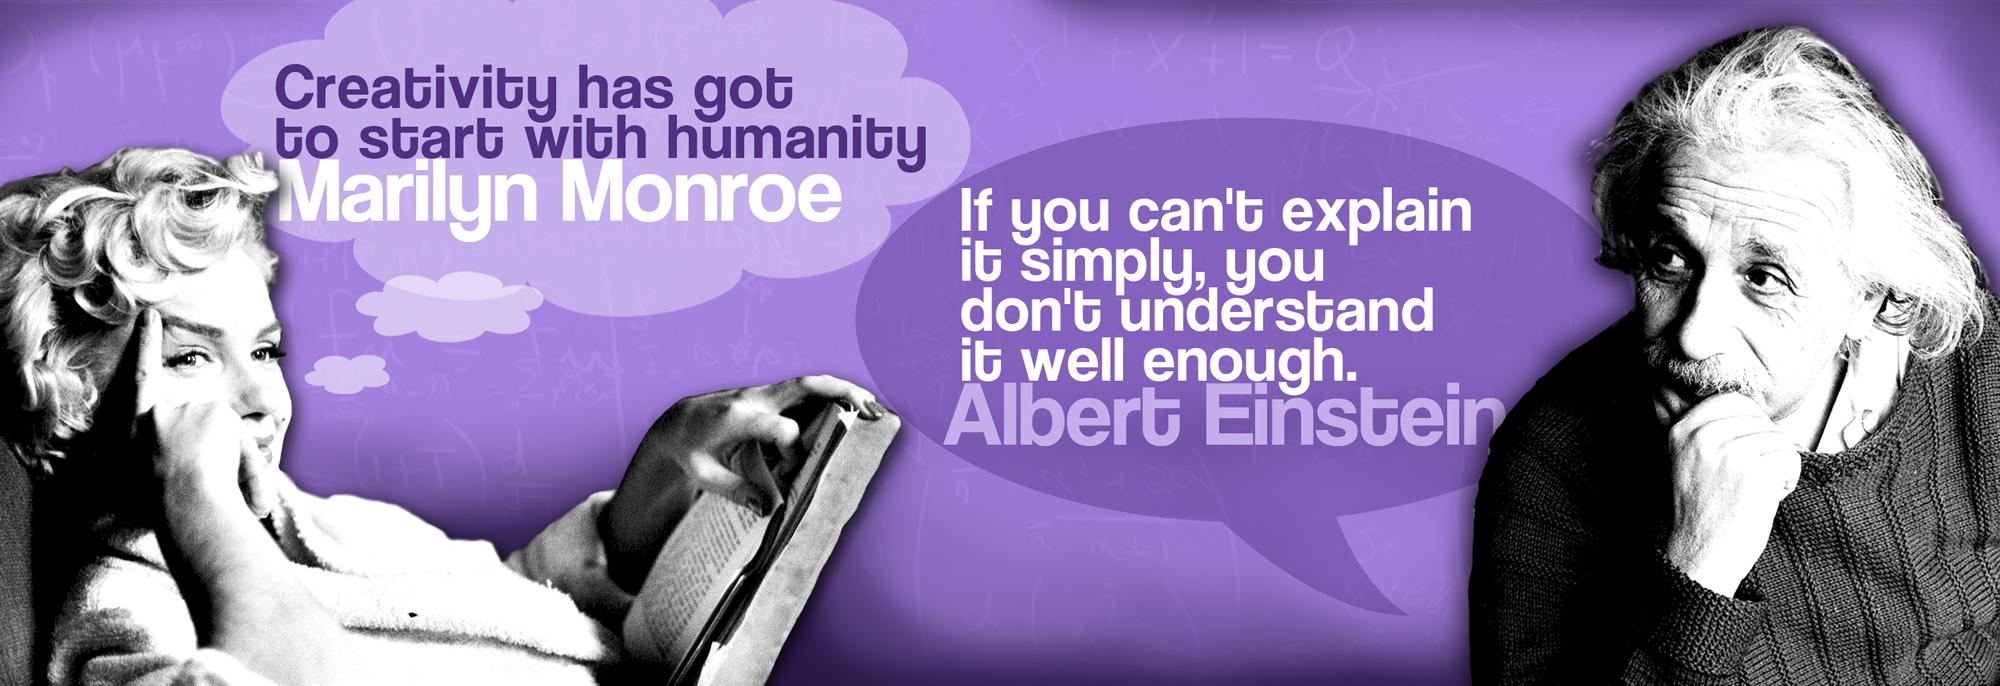 Creativity social media image Marilyn Monroe and Albert Einstein